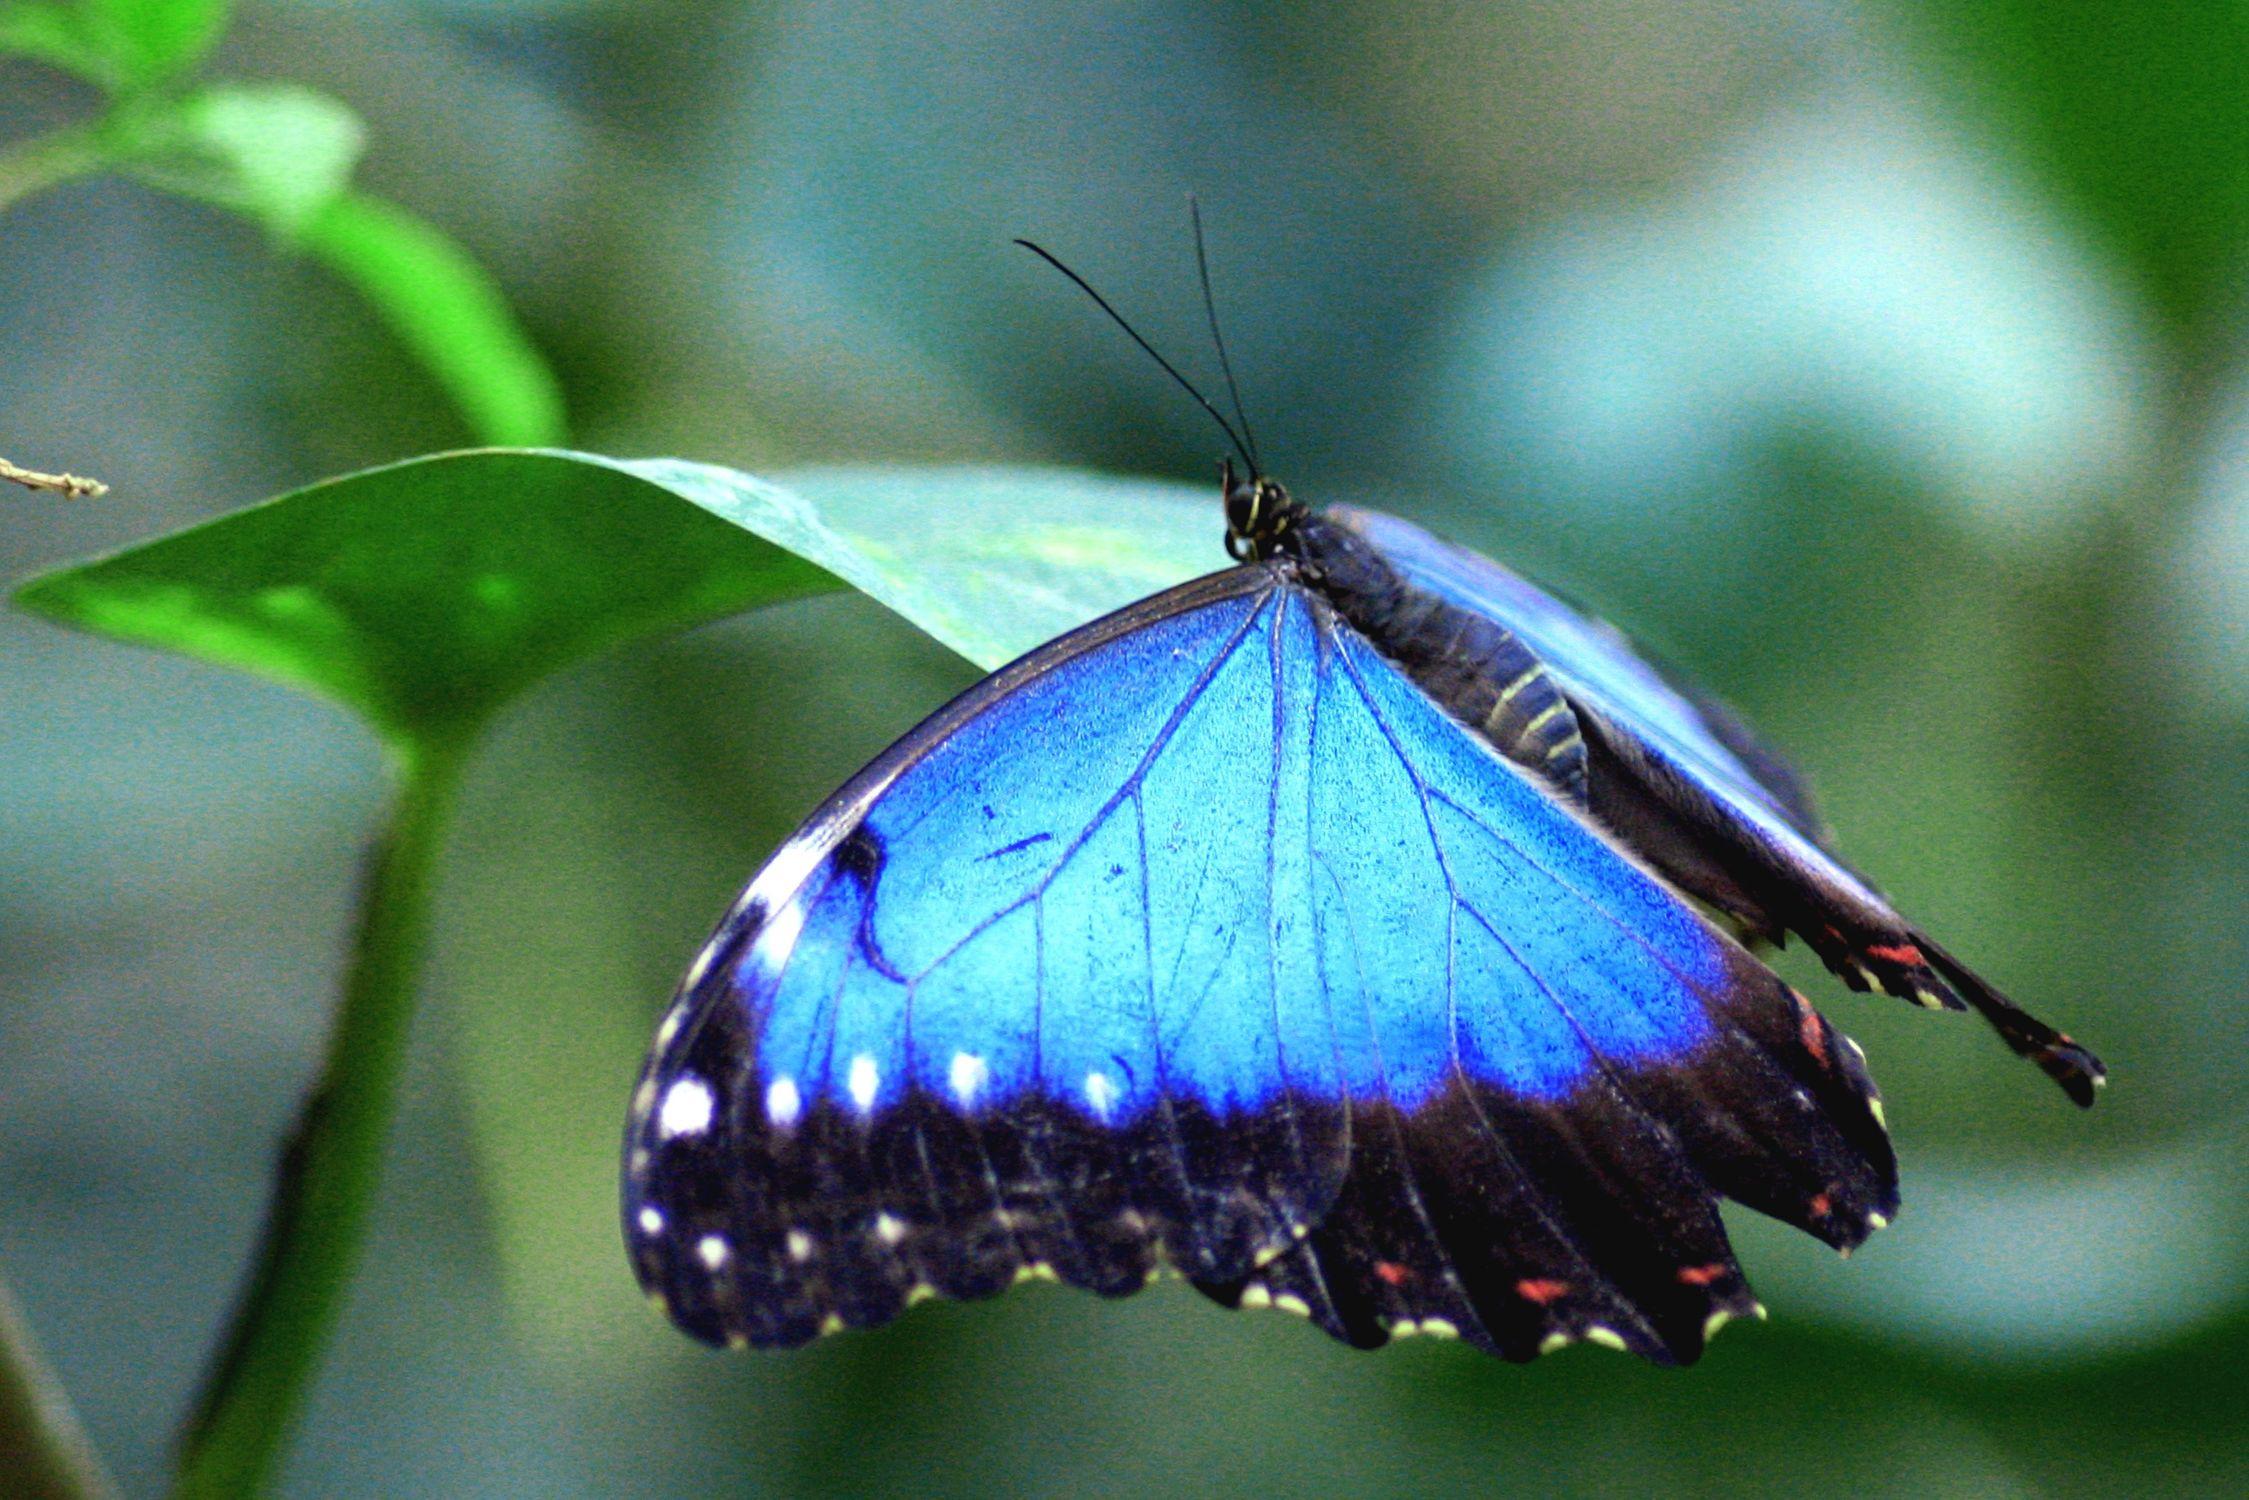 Bild mit Tiere, Natur, Insekten, Insekten, Blau, Azurblau, Schmetterlinge, Tier, Schmetterling, butterfly, Insekt